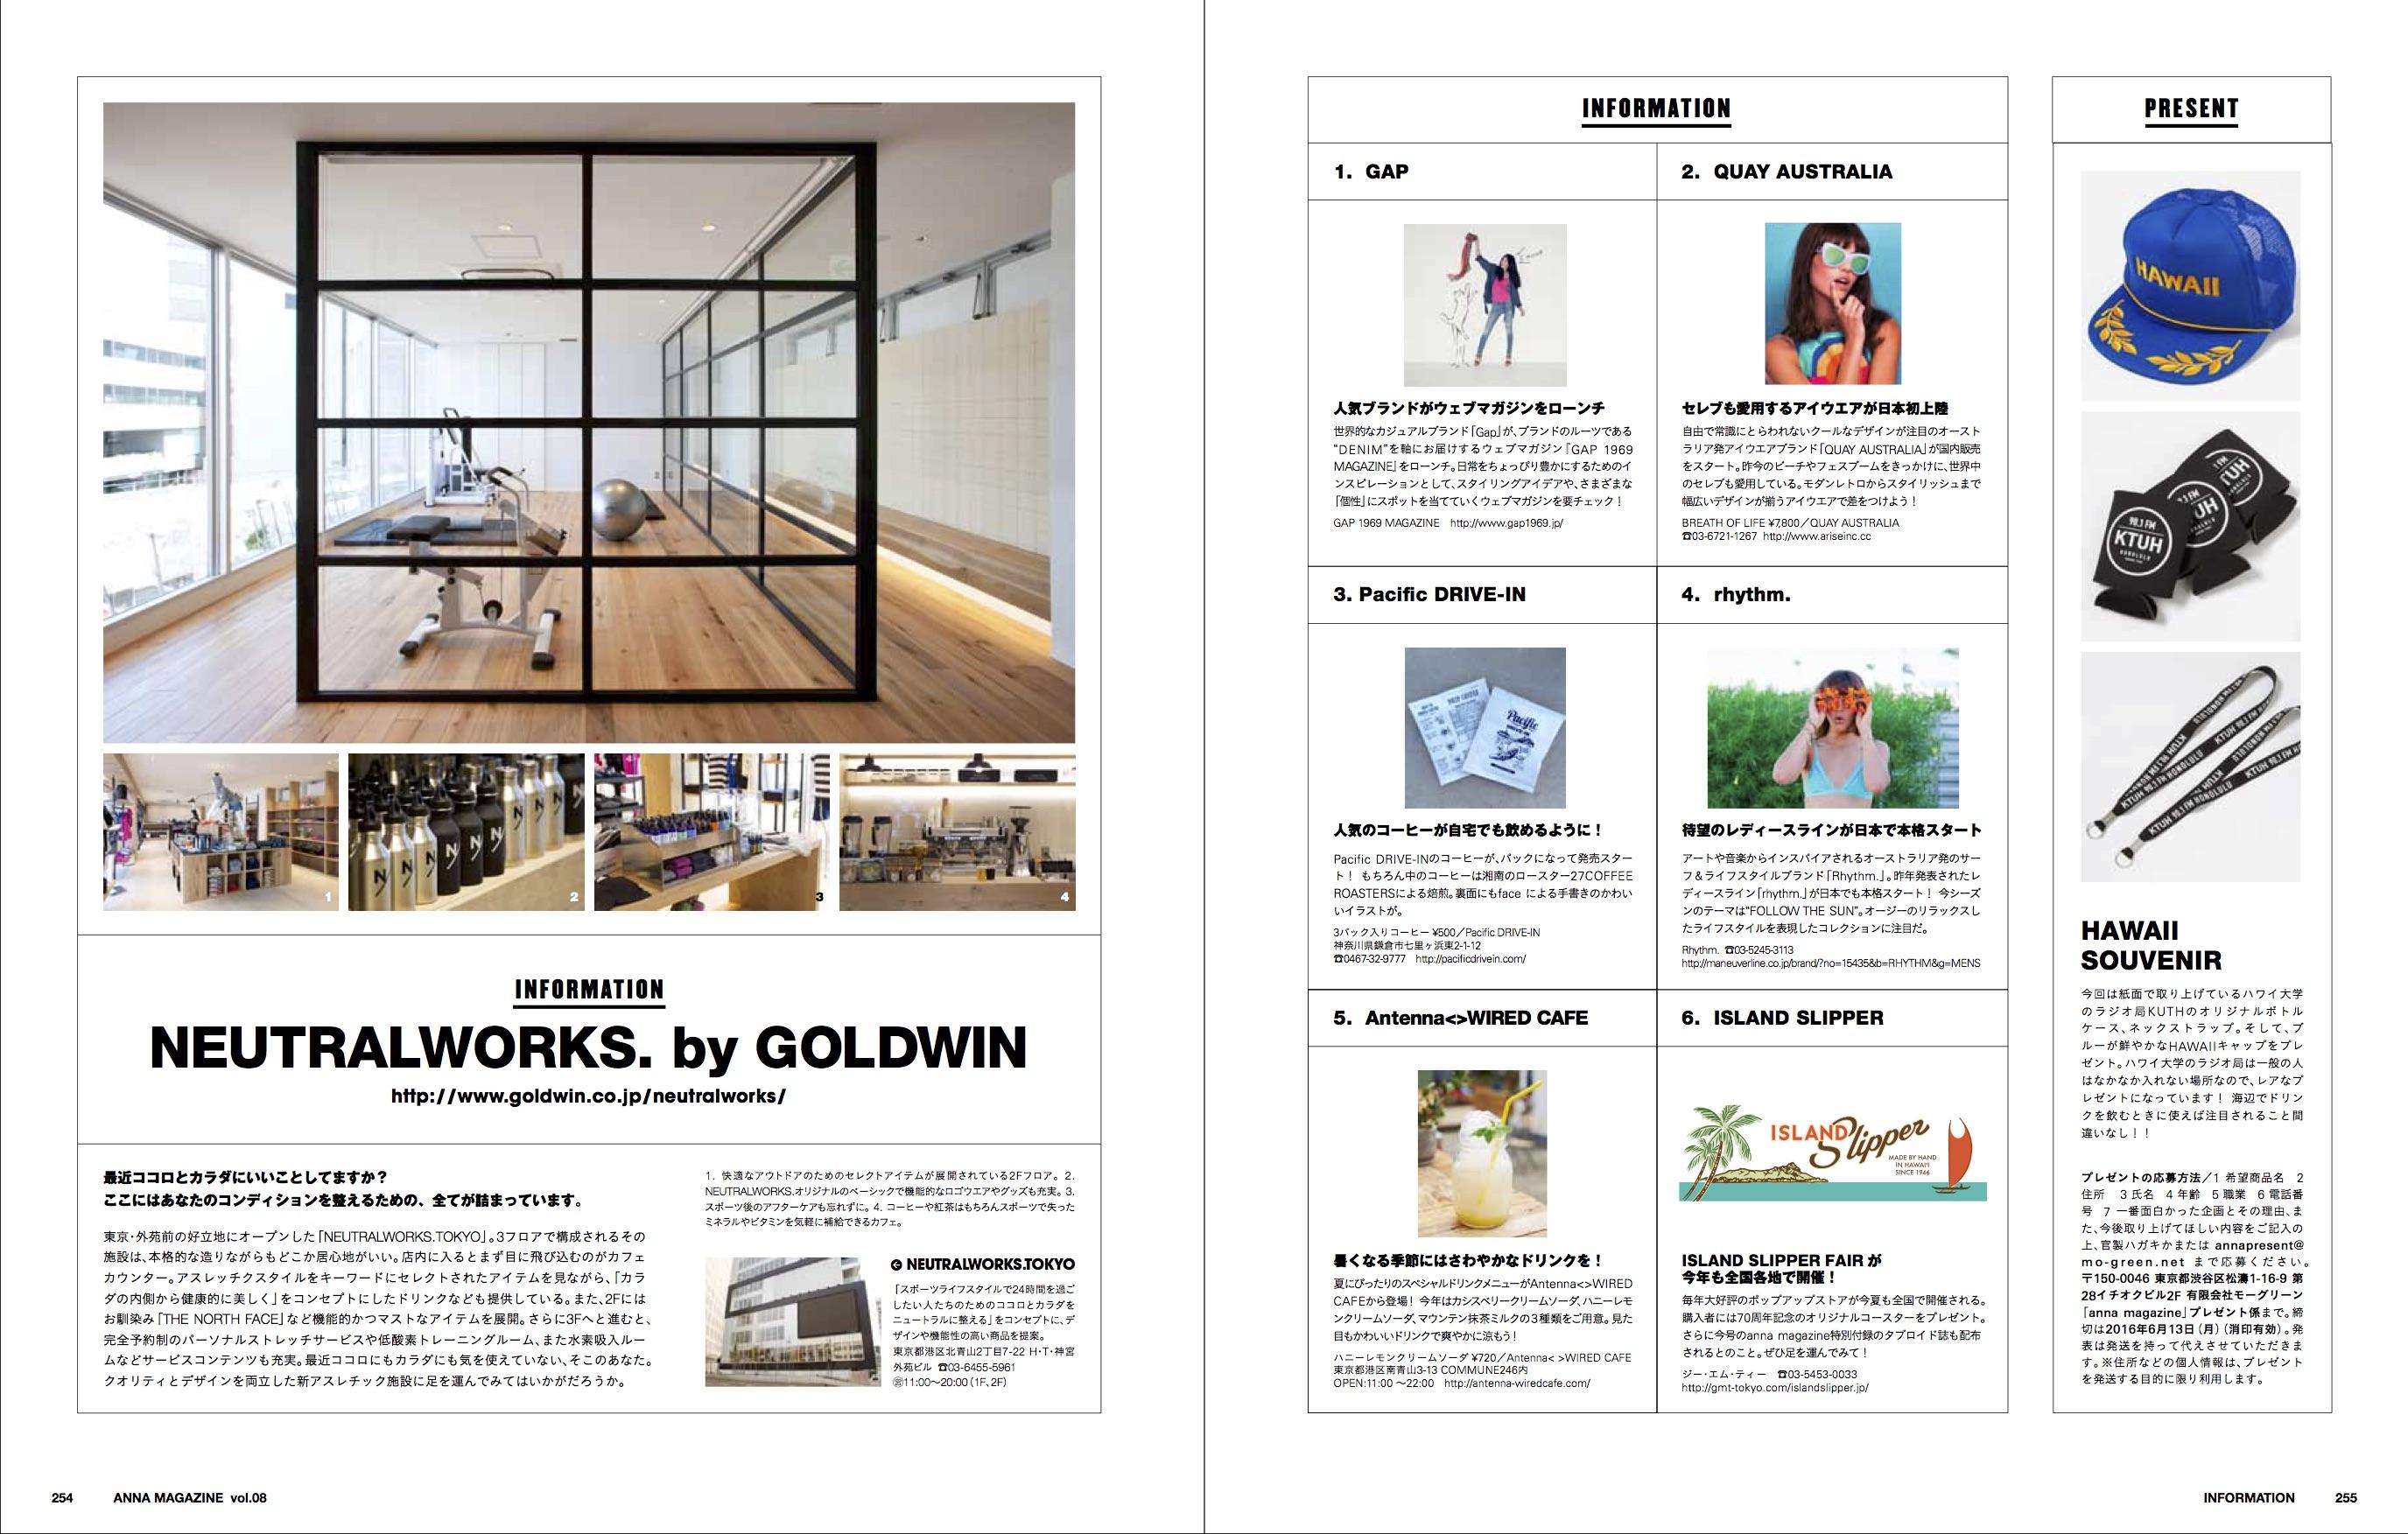 anna magazine vol.8 P128